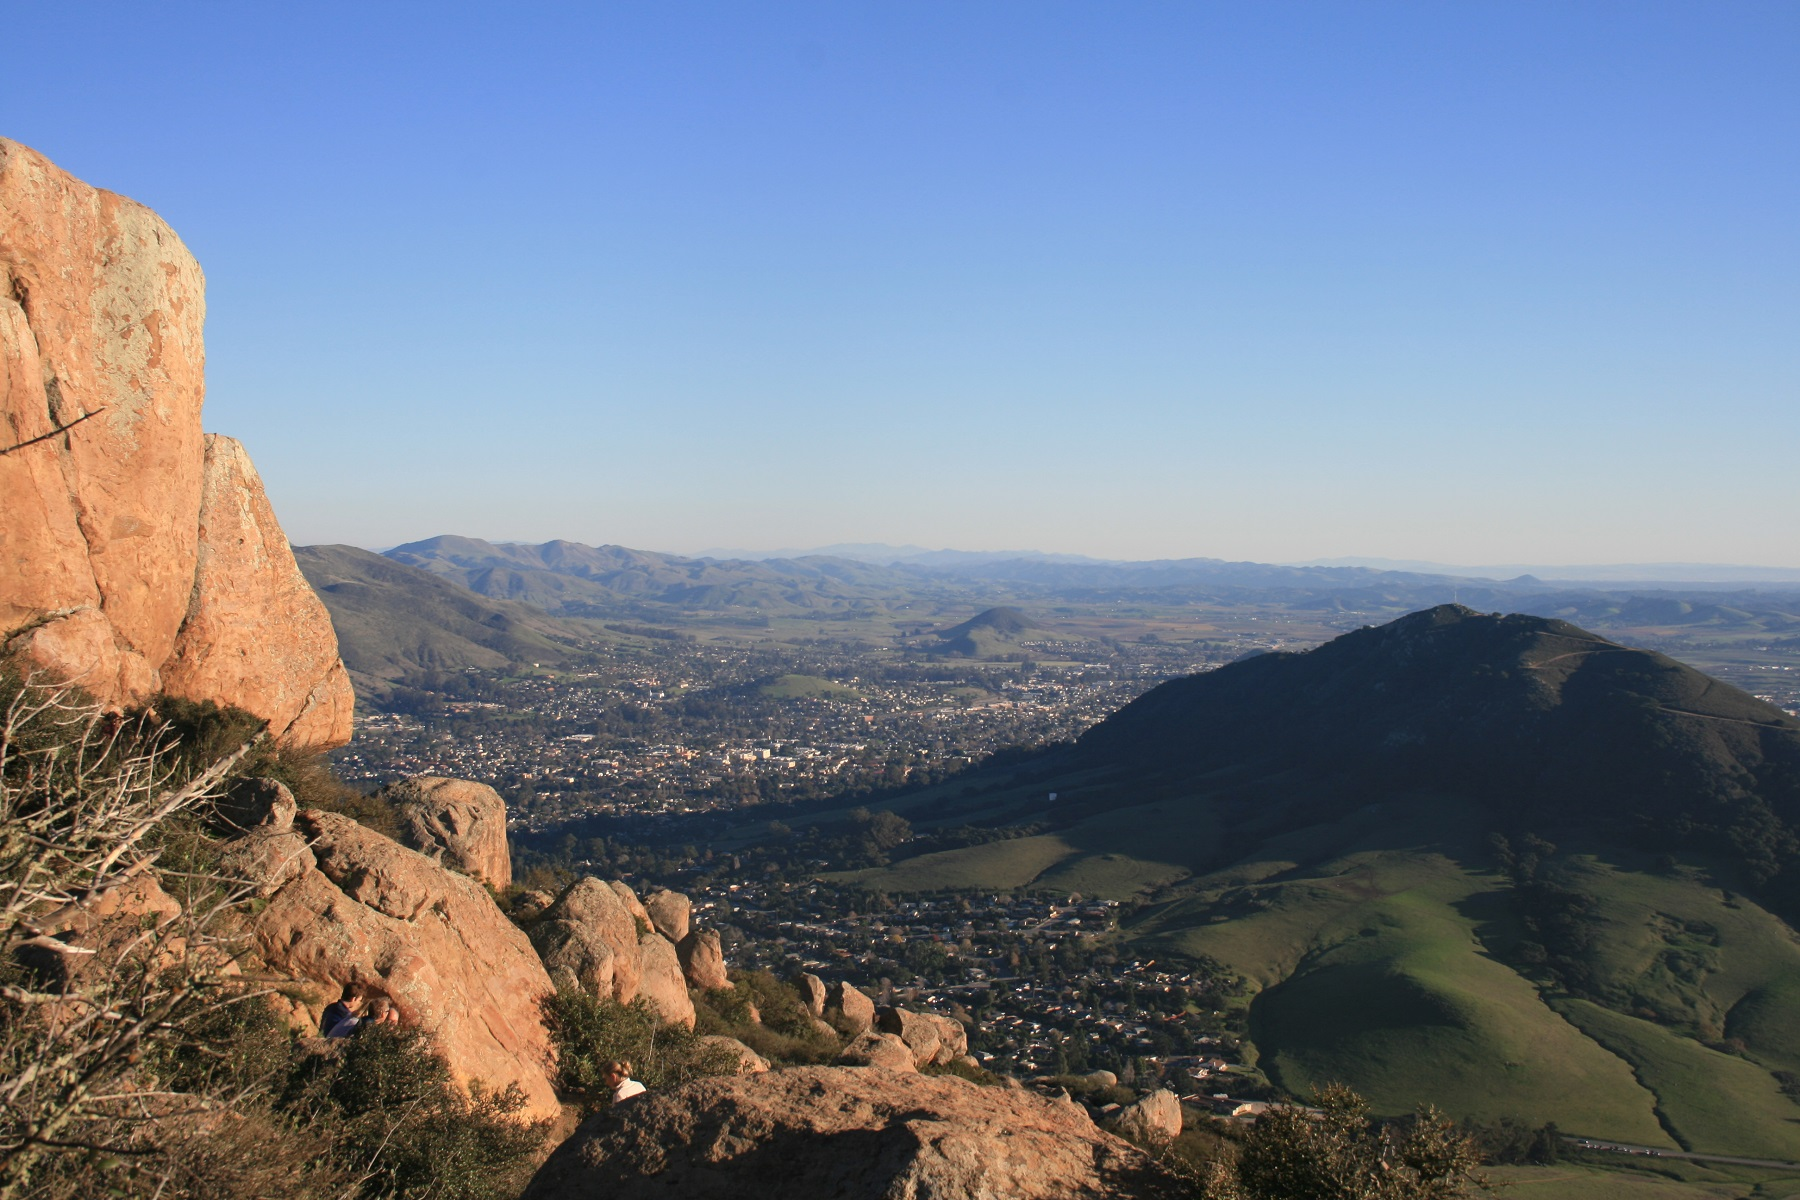 View from Bishop Peak, San Luis Obispo, CA